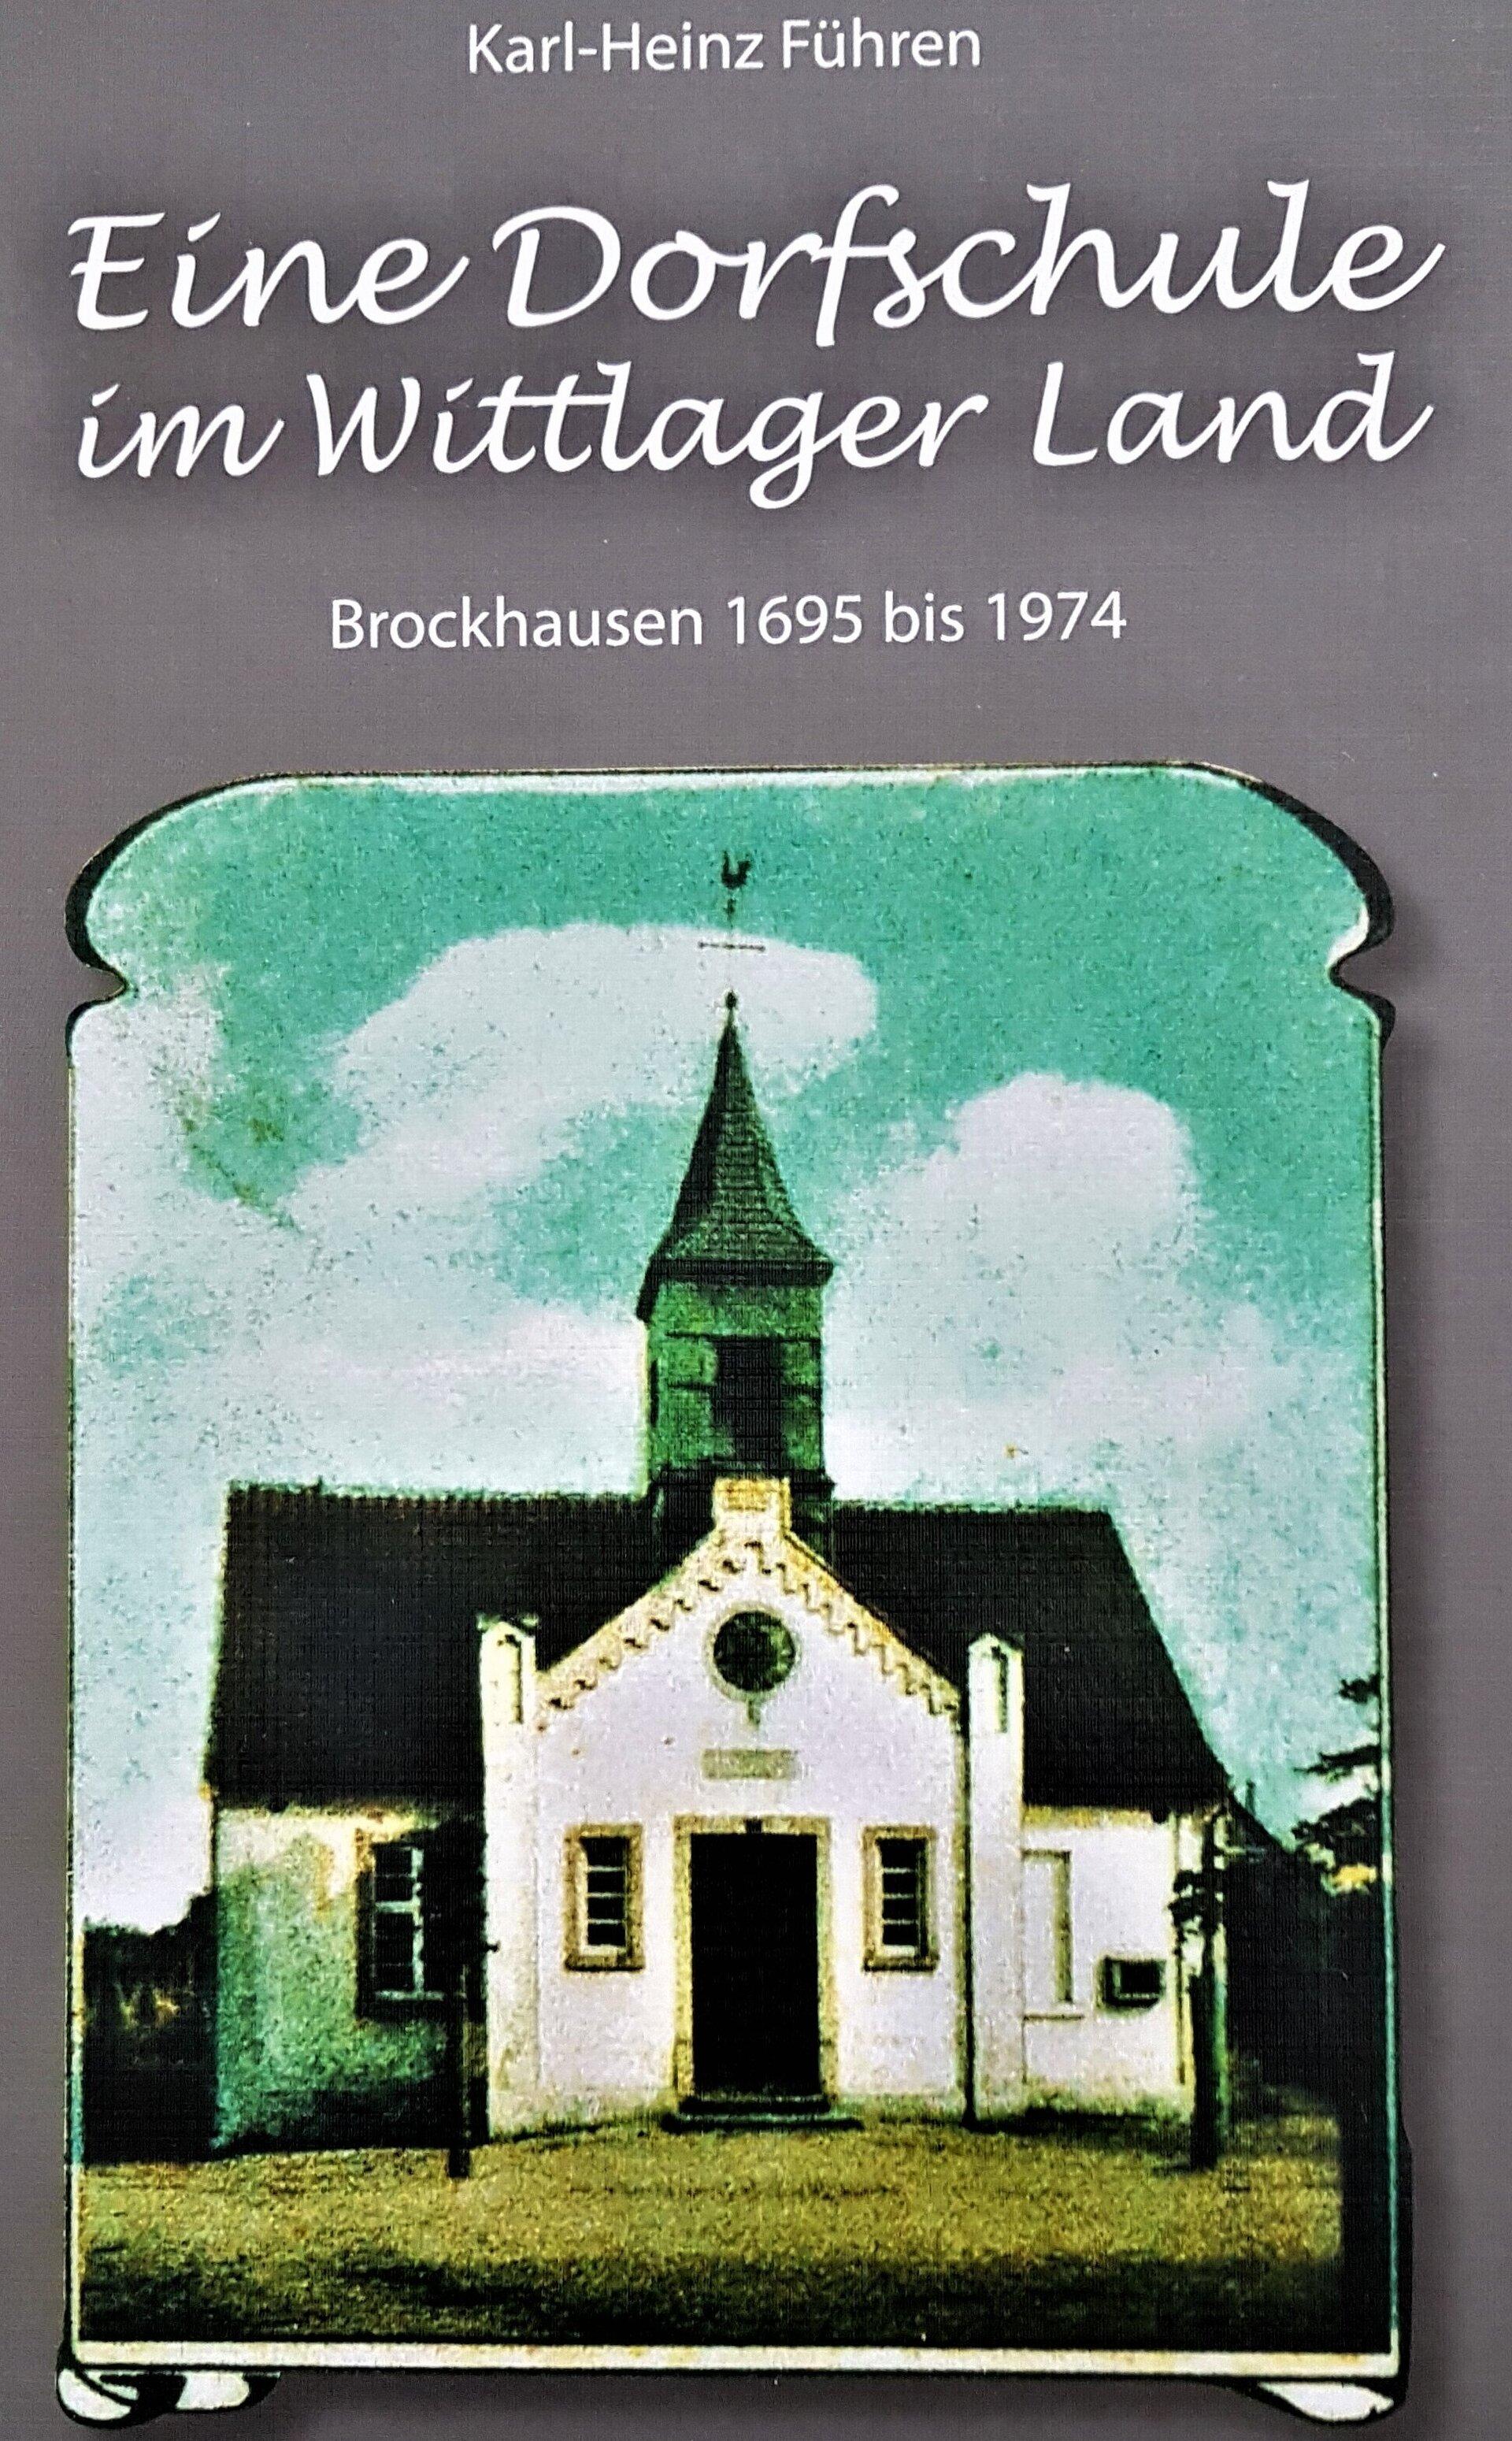 Brockhausen